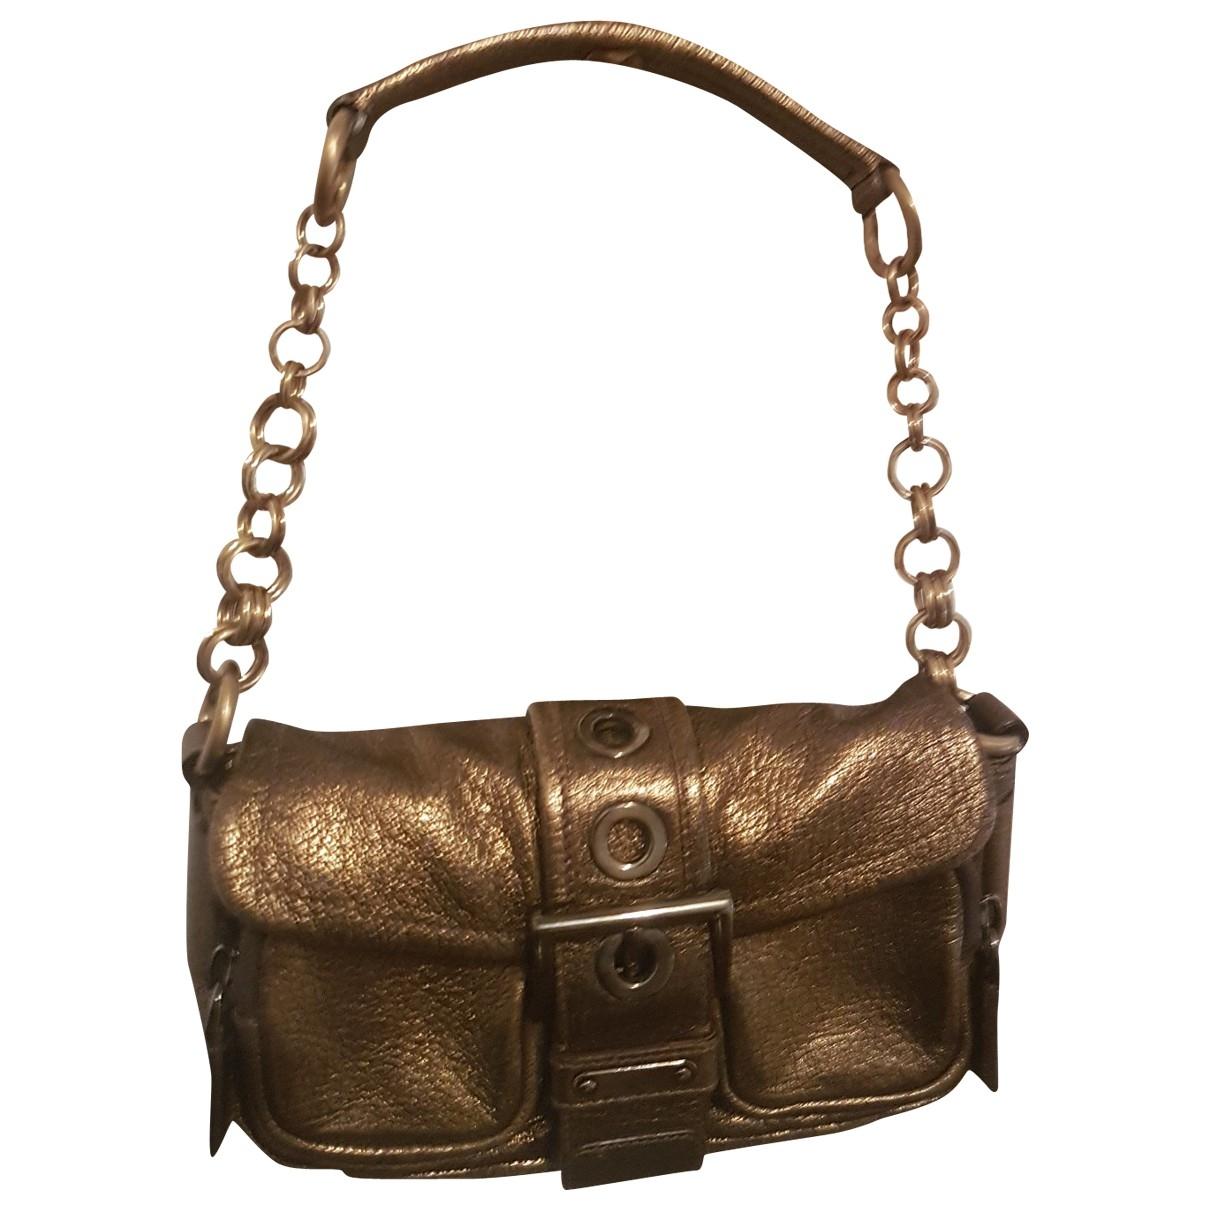 Prada \N Leather handbag for Women \N